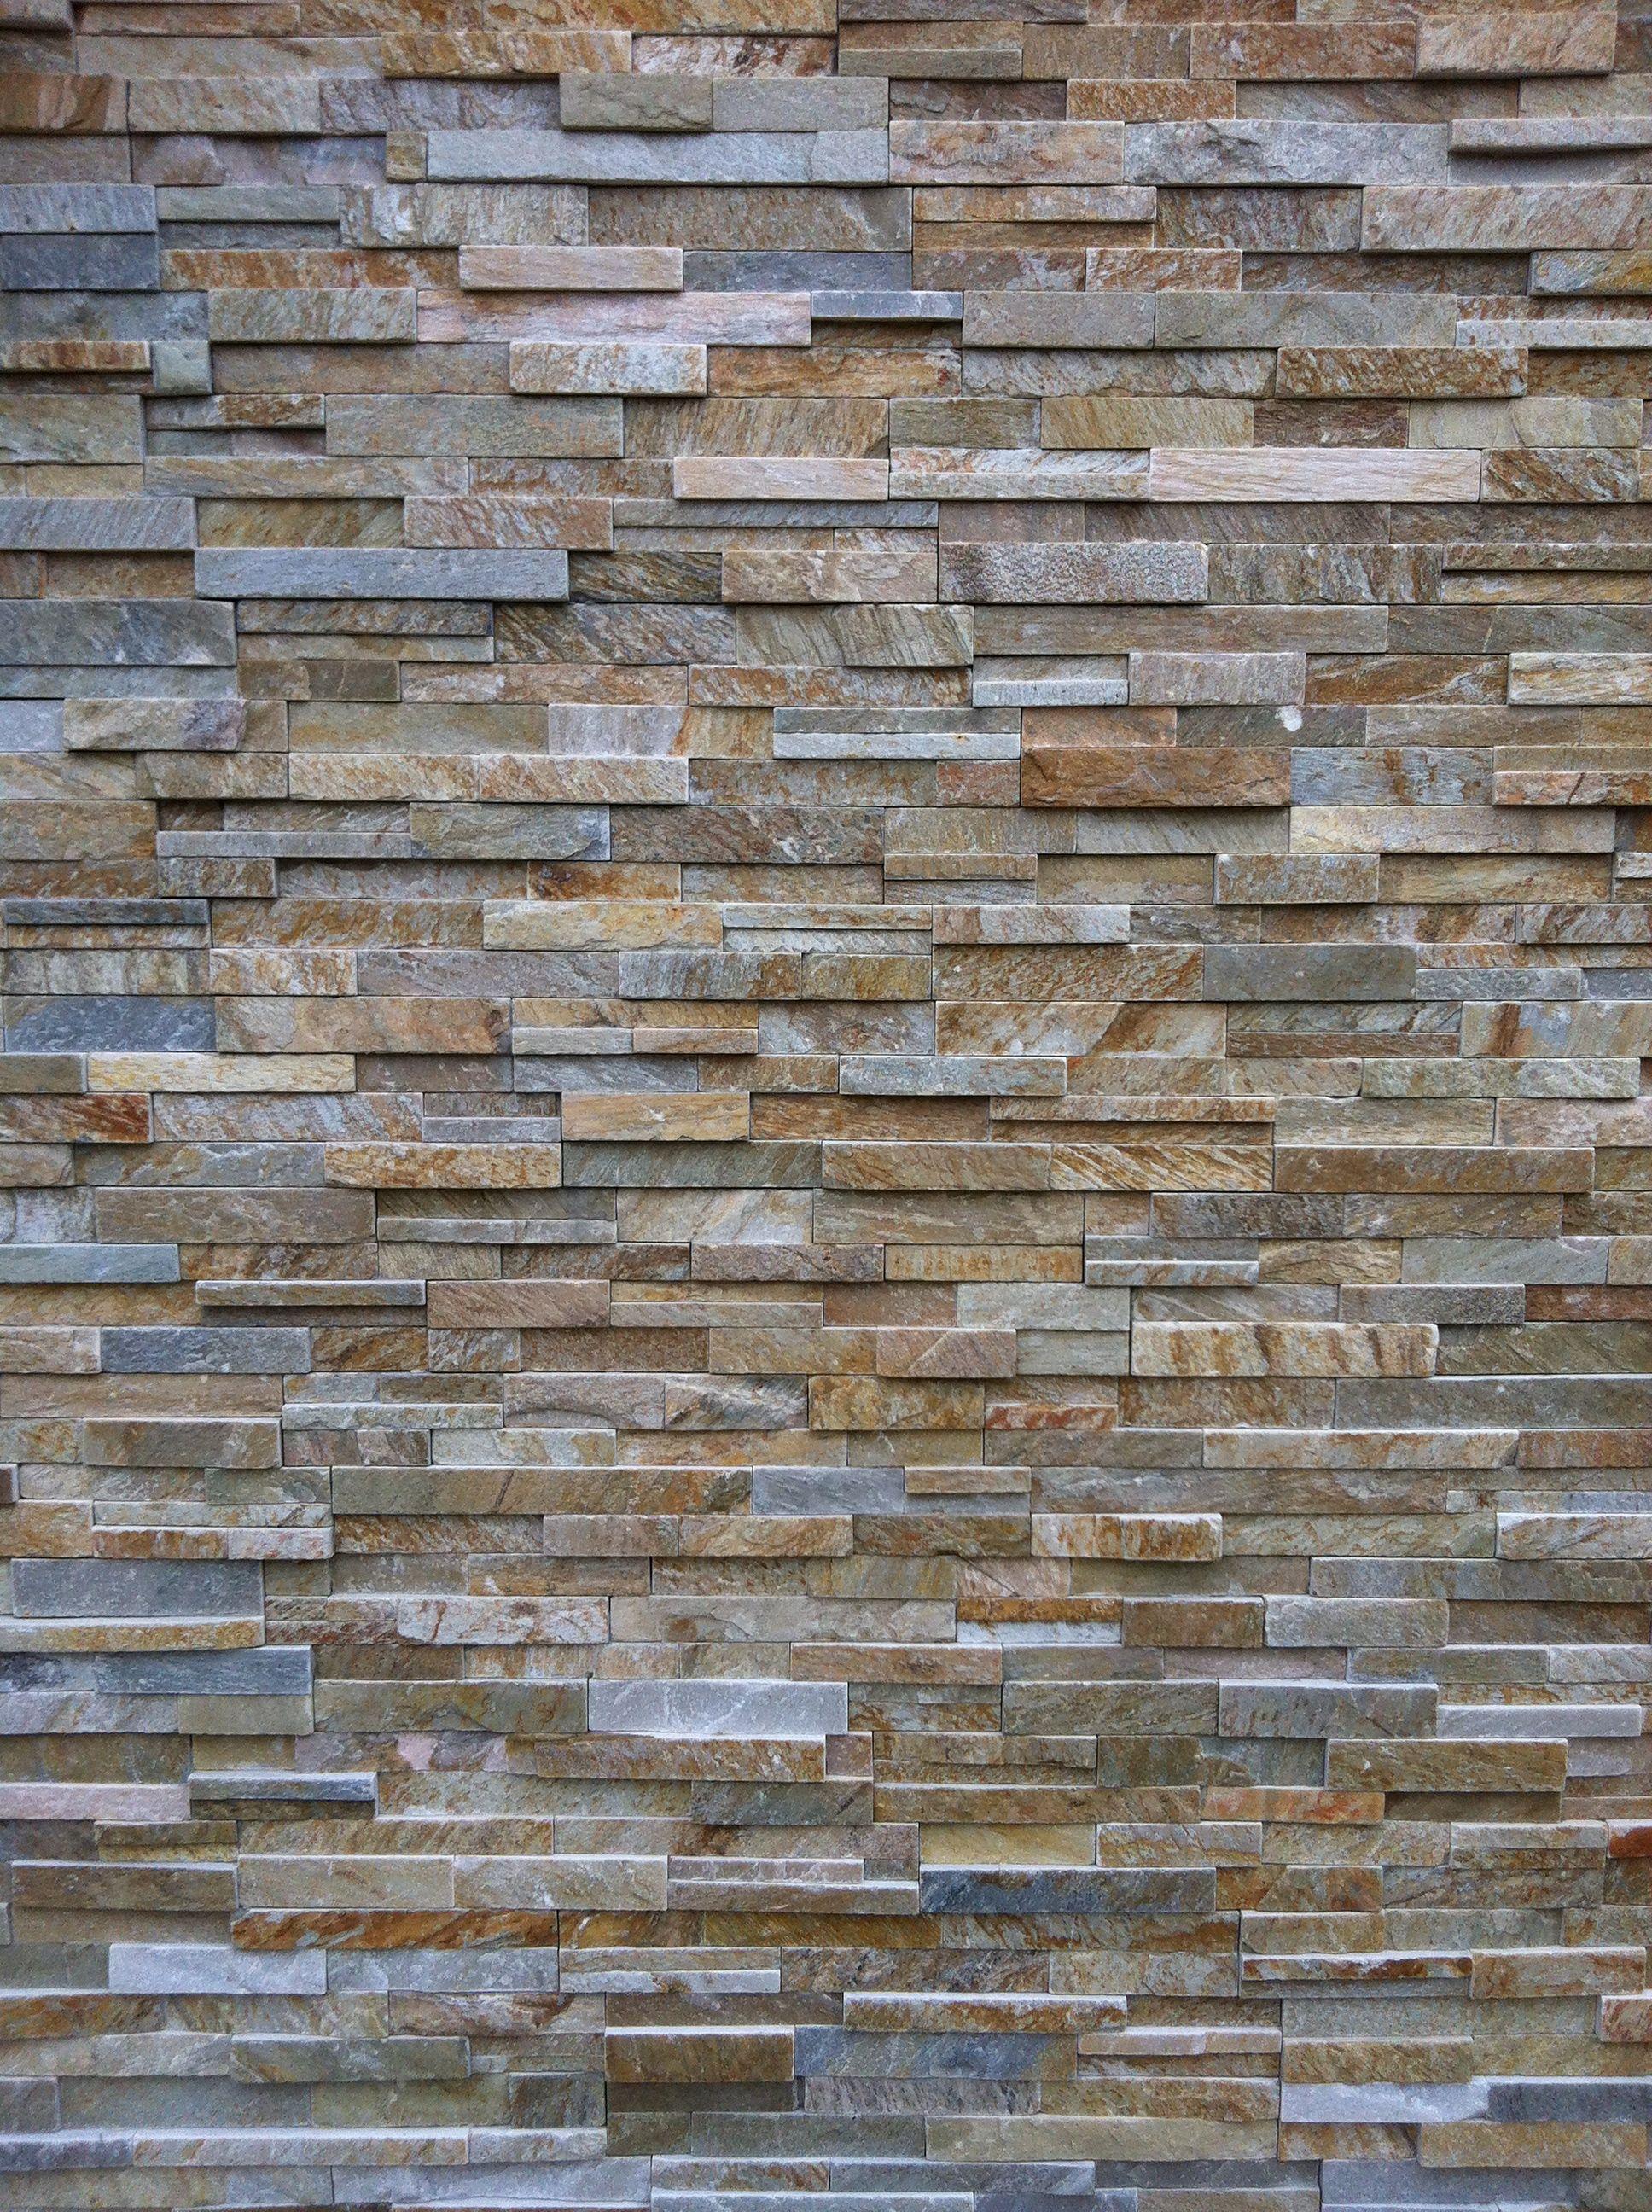 Natural Stone Veneers ǀ Faux Stone Siding ǀ Stone Veneer: Tan/Grey (more Contemporary Than